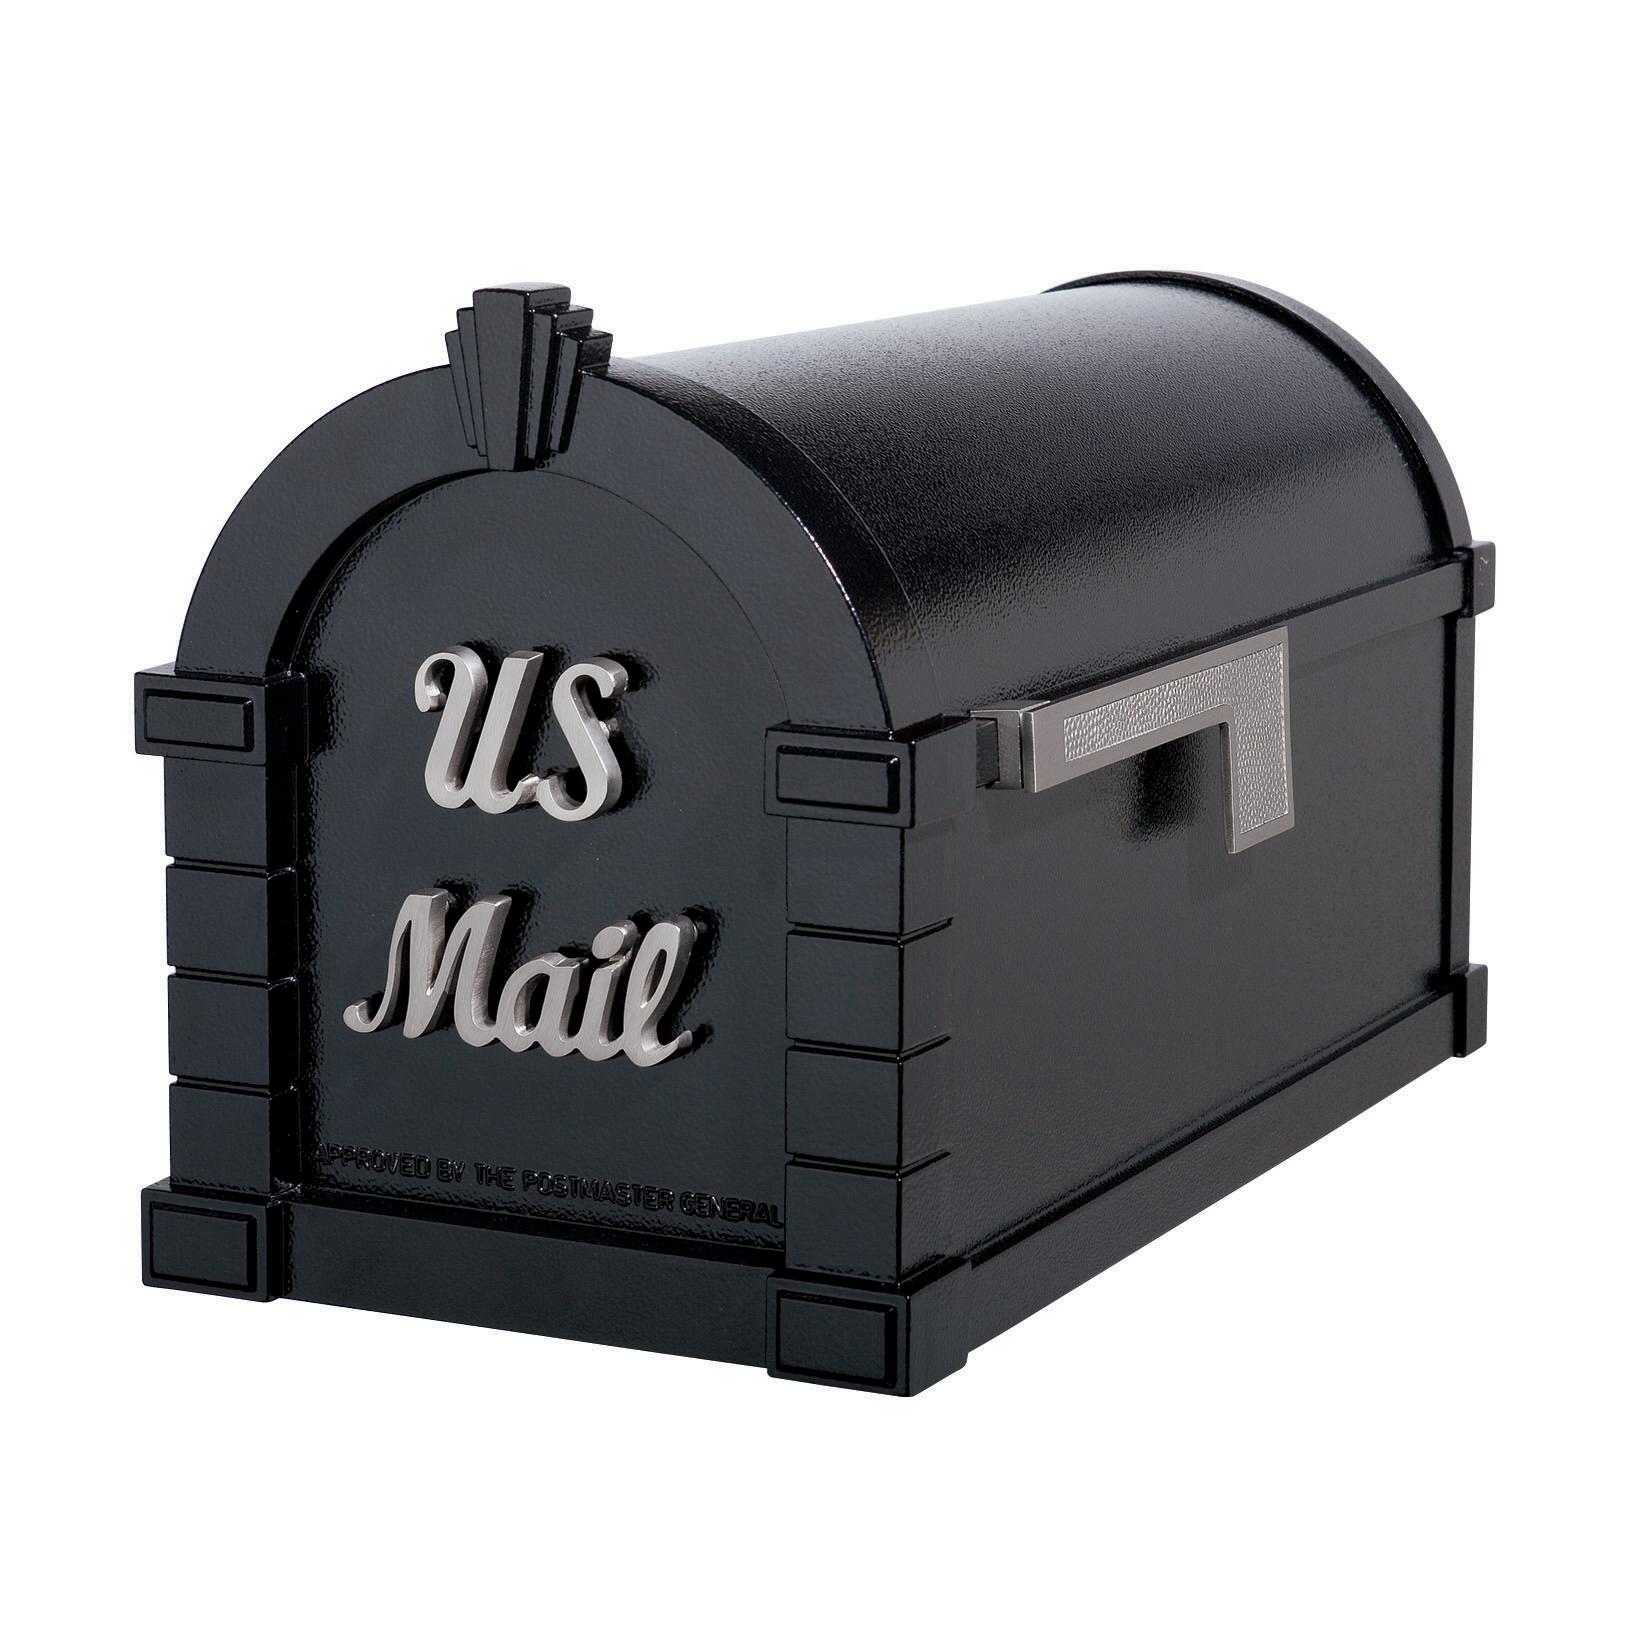 Gaines Signature Keystone MailboxesBlack with Satin Nickel